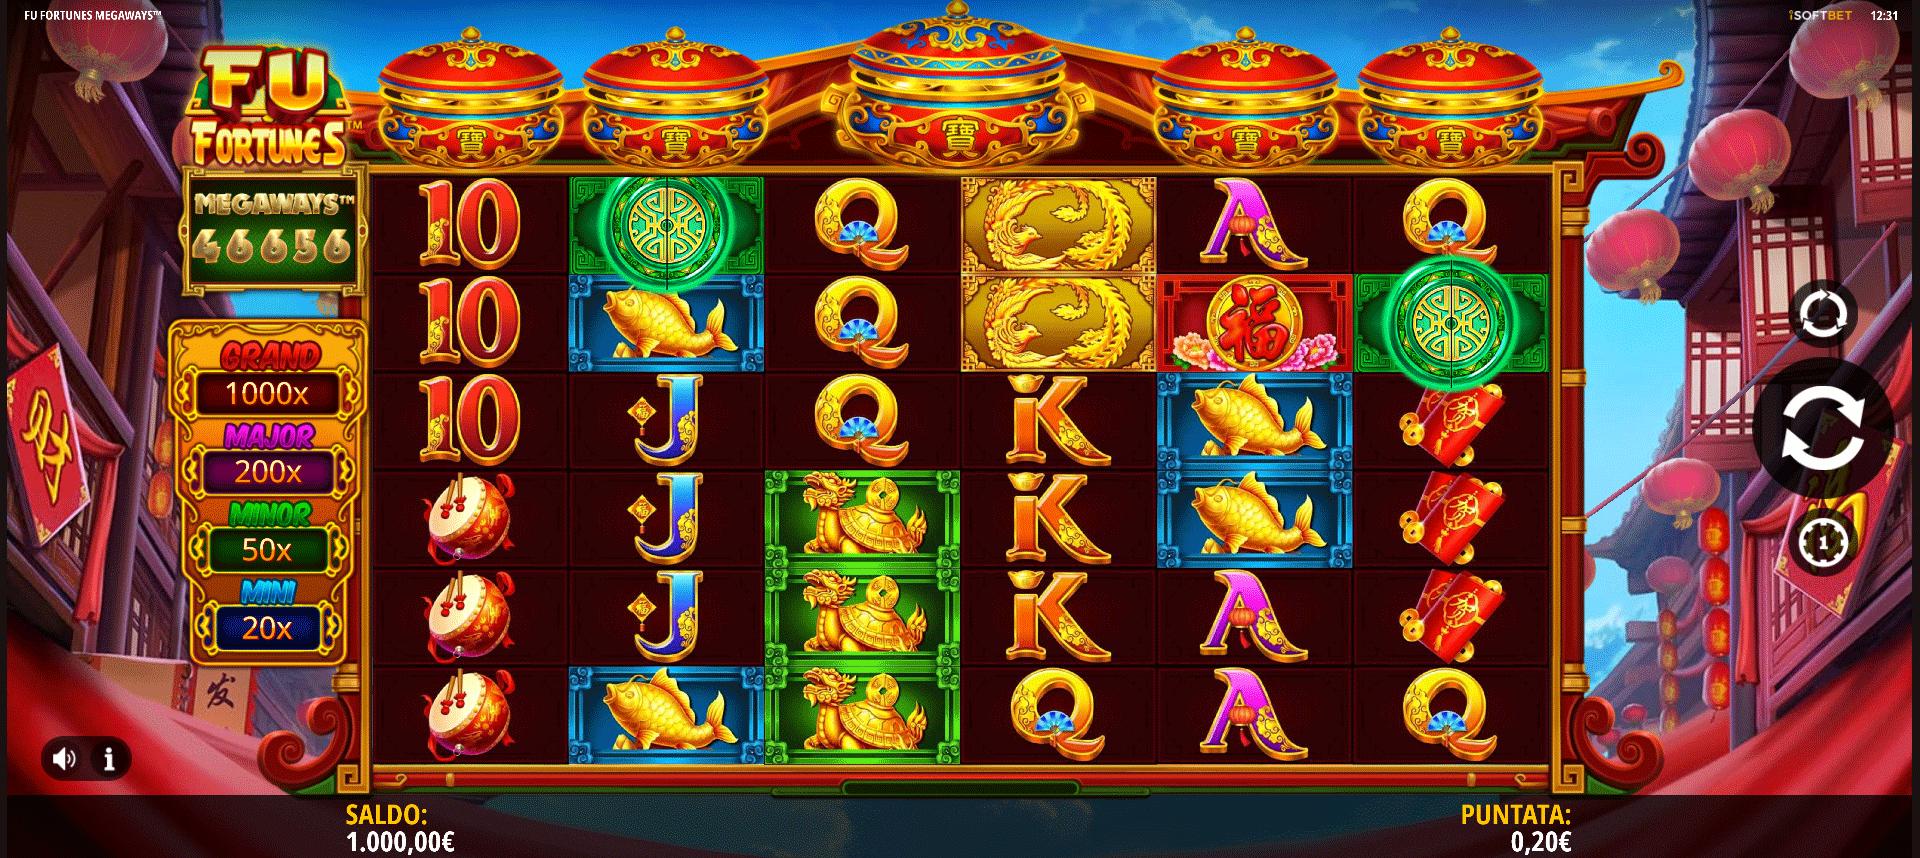 Slot Fu Fortunes Megaways